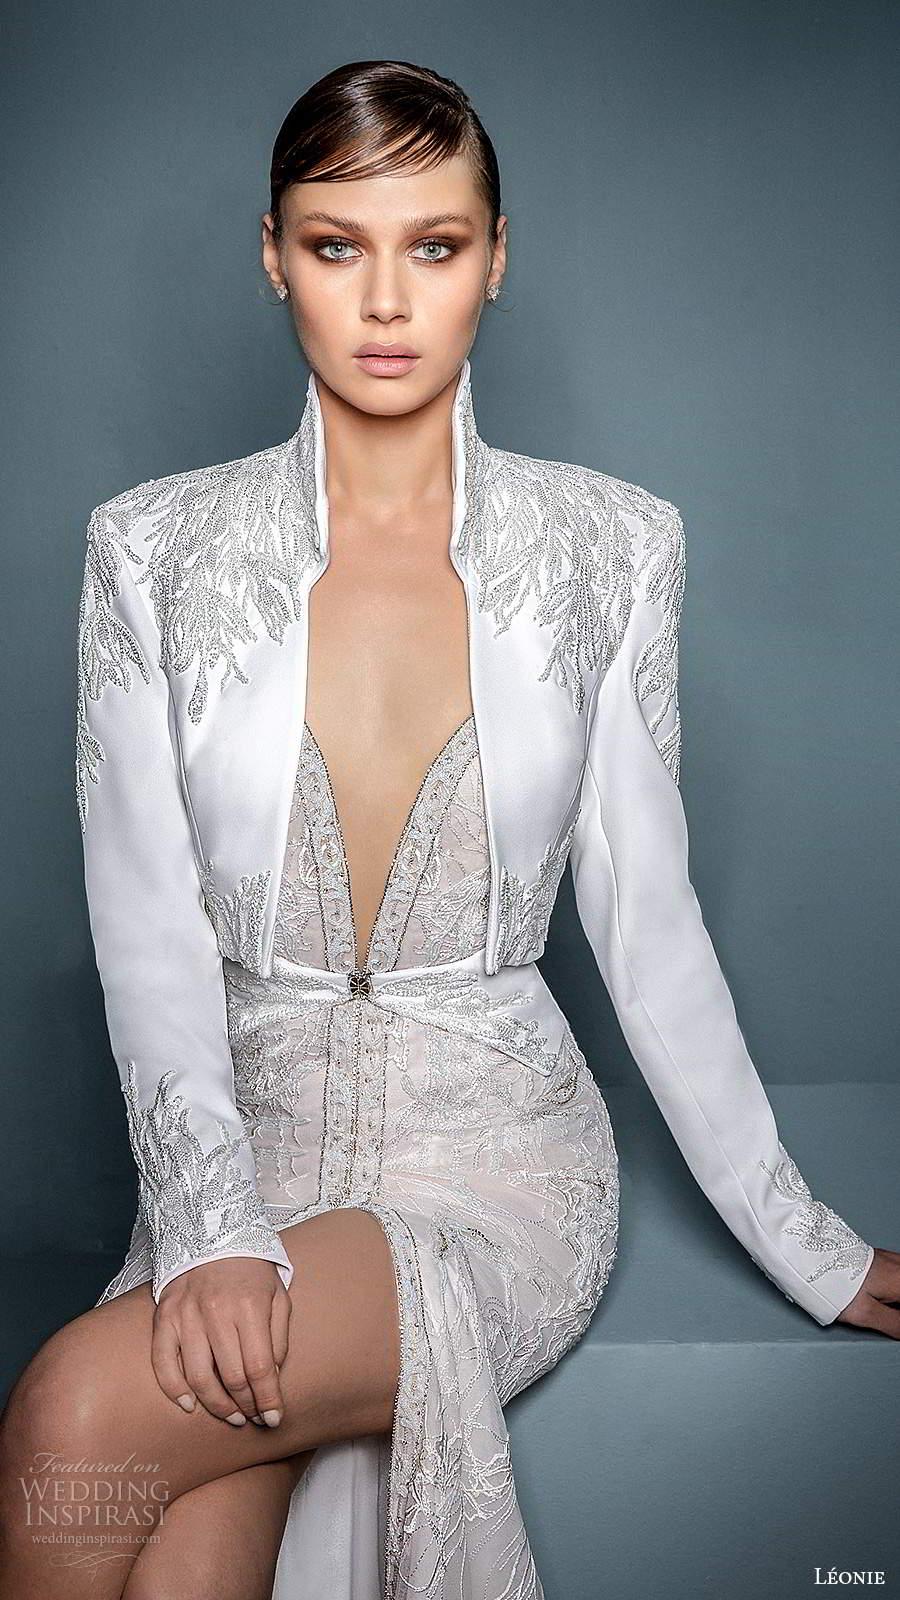 leonie bridal 2020 bridal sleeveless thin straps plunging v neckline embellished fit flare mermaid wedding dress slit skirt chapel train jacket (1) zv